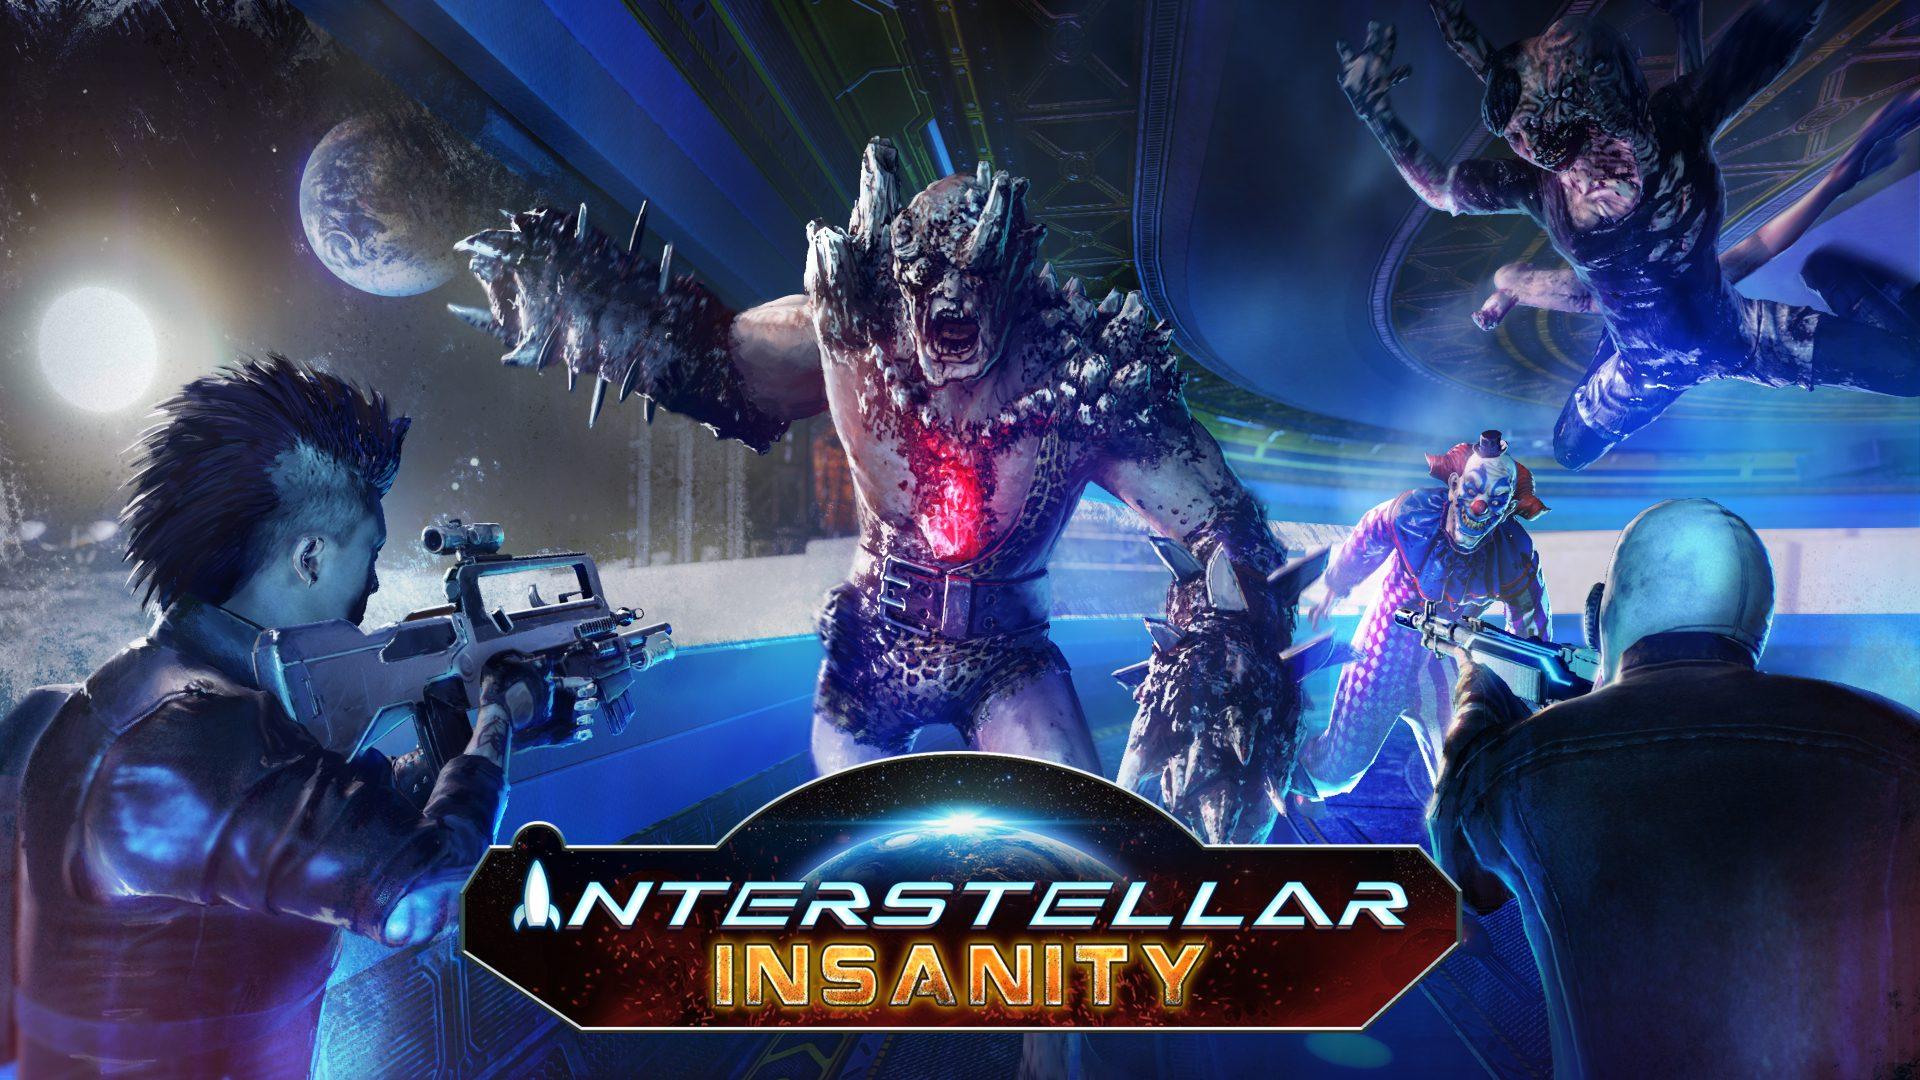 Killing Floor 2: Interstellar Insanity key art | Tripwire Interactive